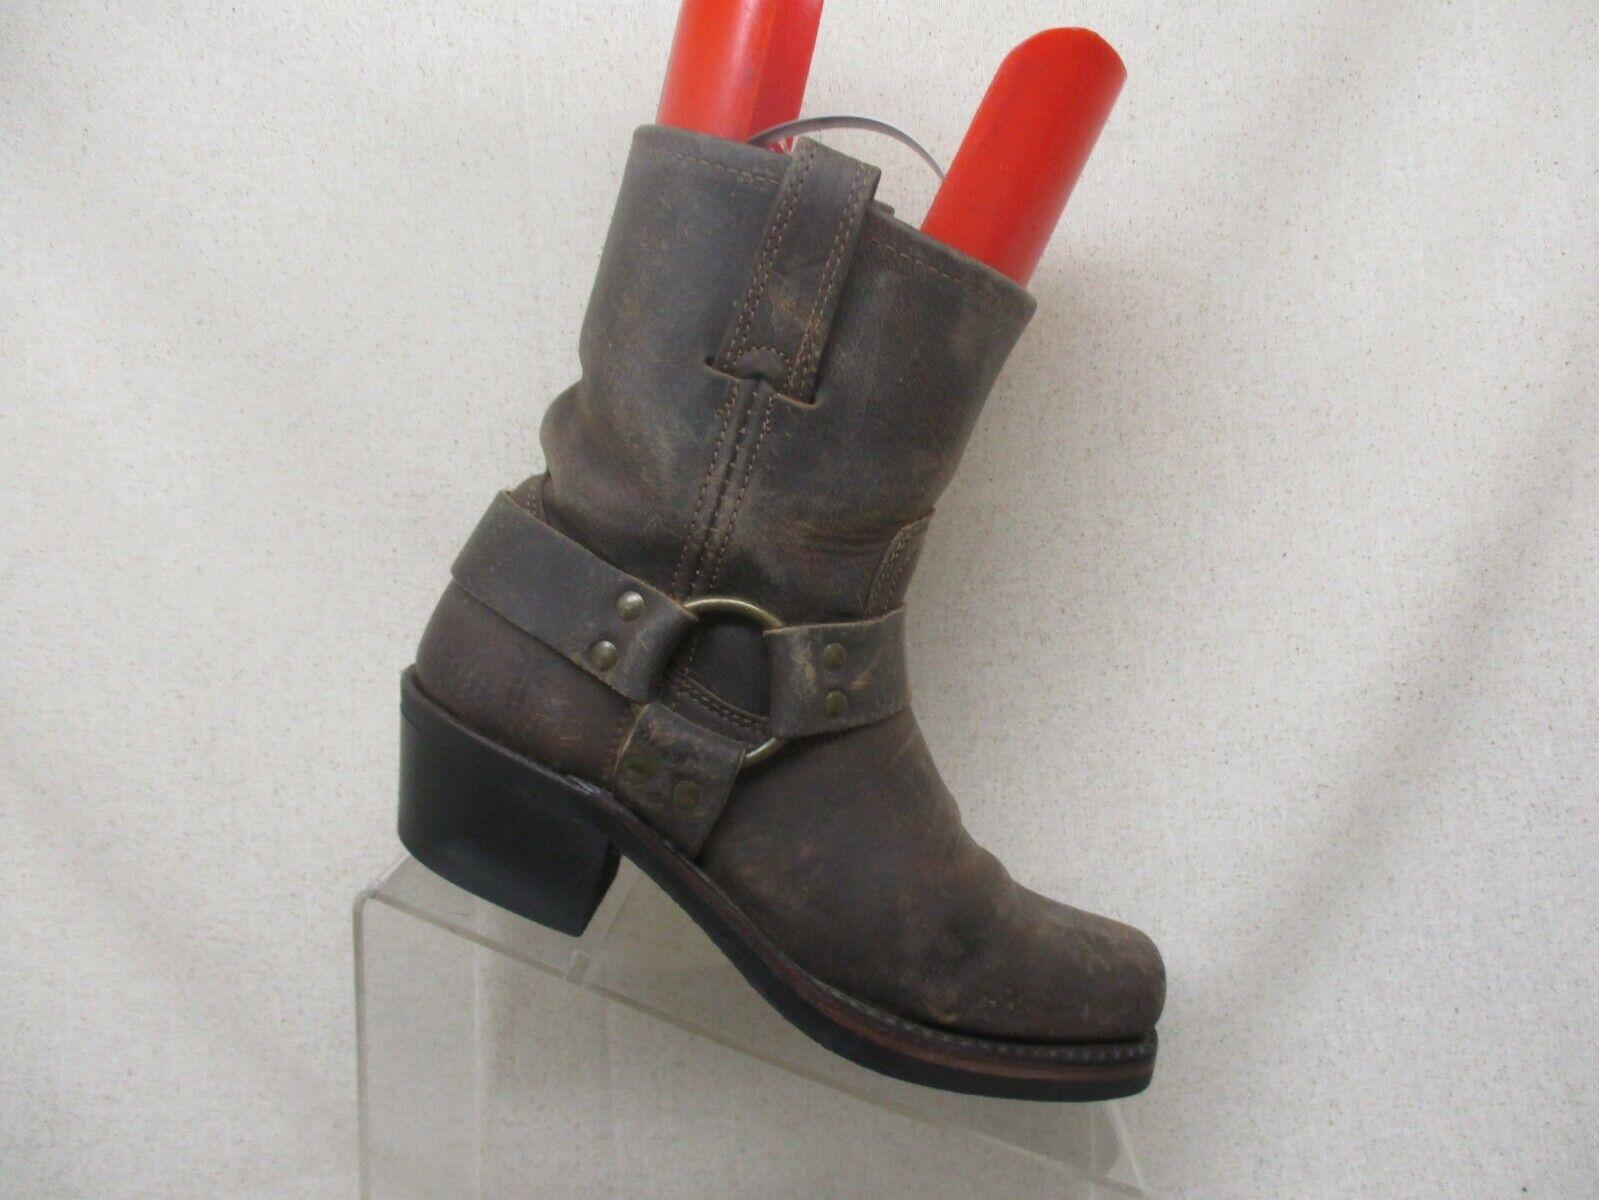 Frye Frye Frye braun Leather Square Toe Harness Motorcycle Stiefel damen Größe 6 M c9708b